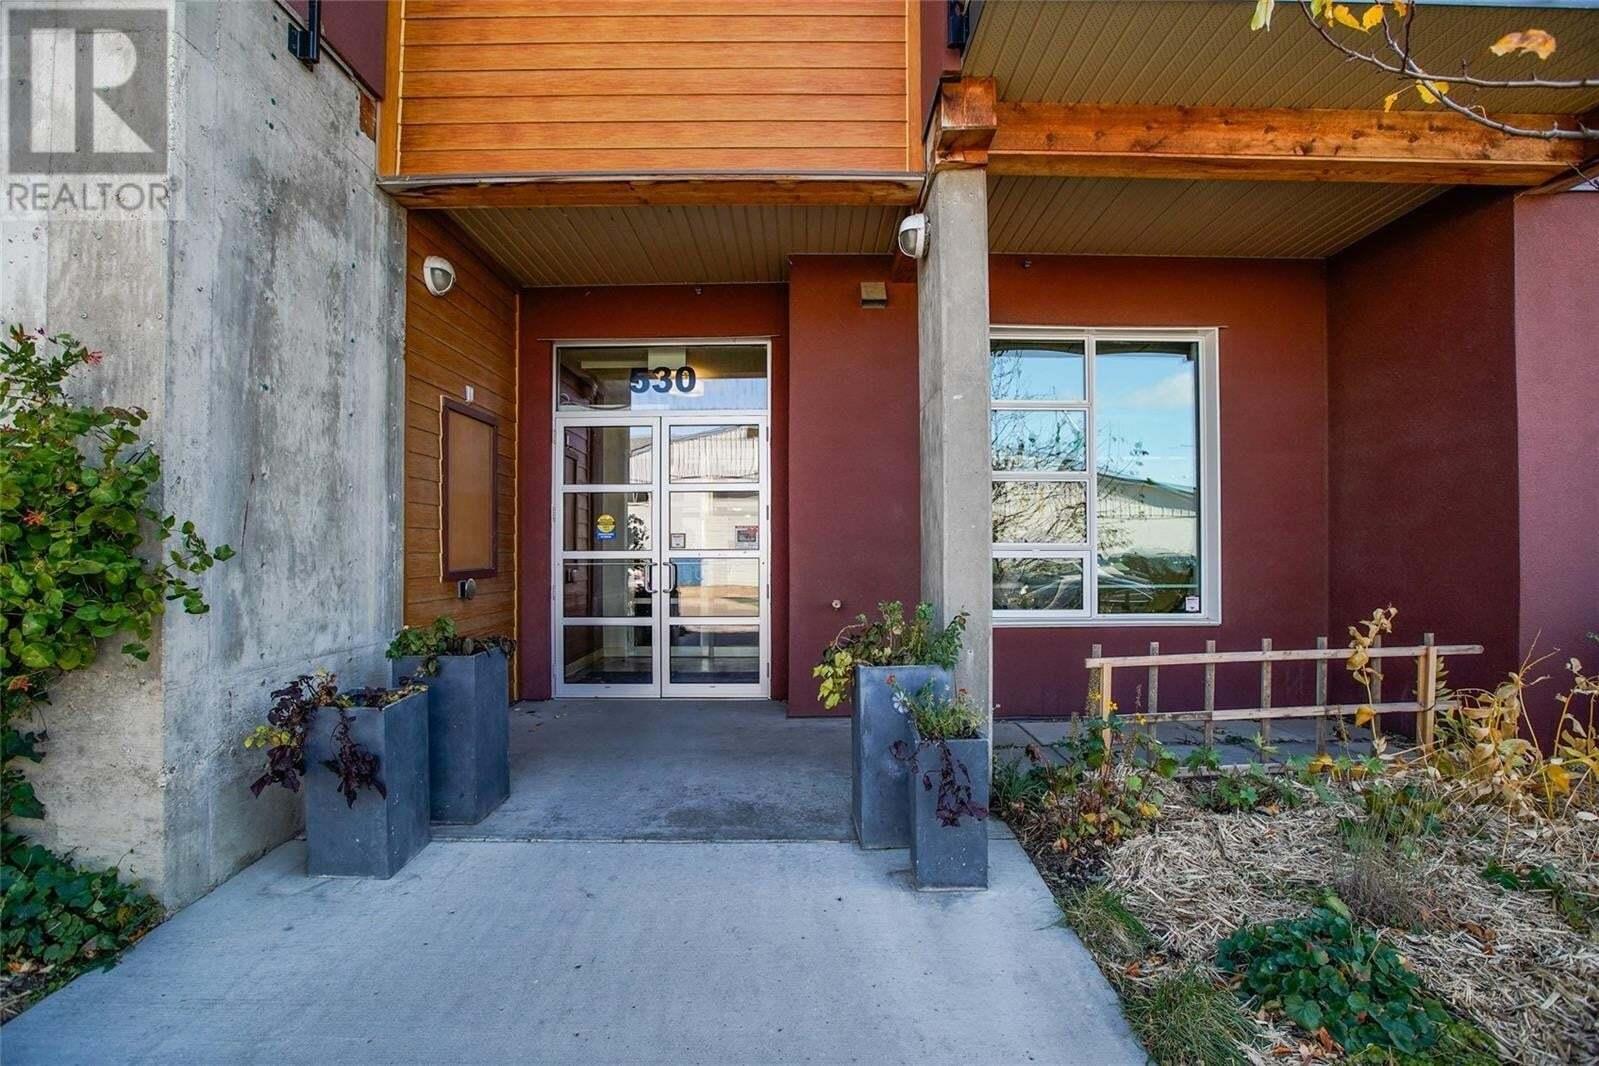 Condo for sale at 530 J Ave S Unit 307 Saskatoon Saskatchewan - MLS: SK830557